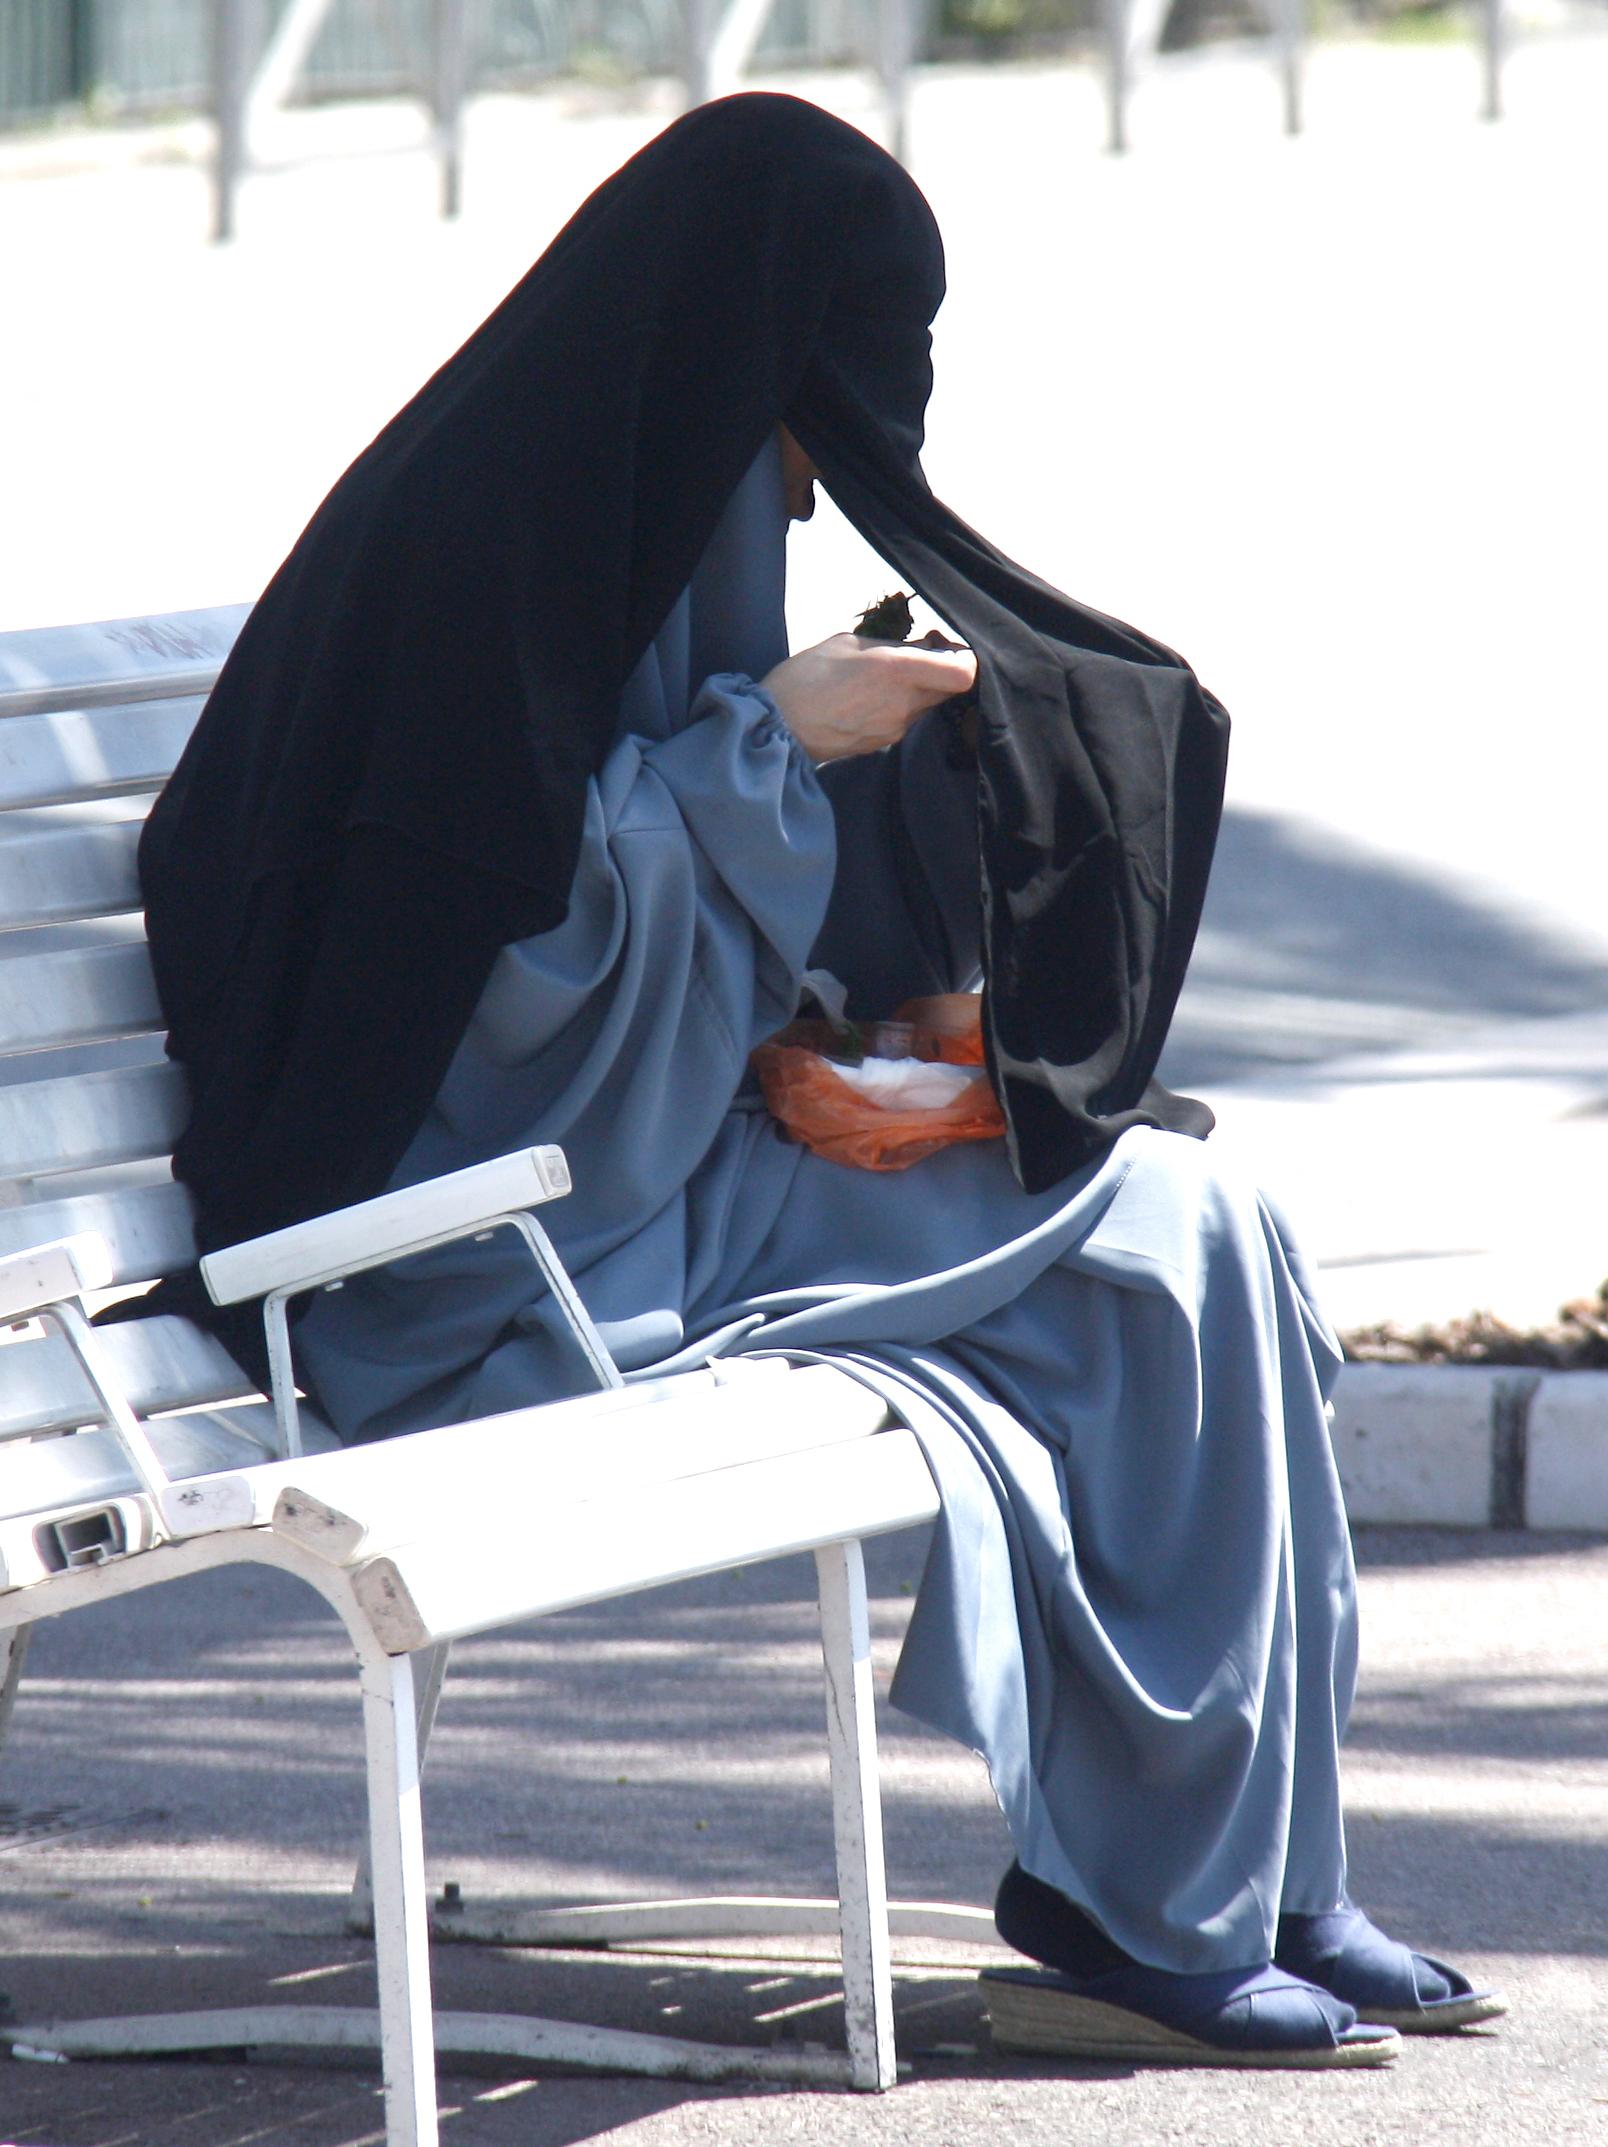 European Court Upholds France's Burqa Ban